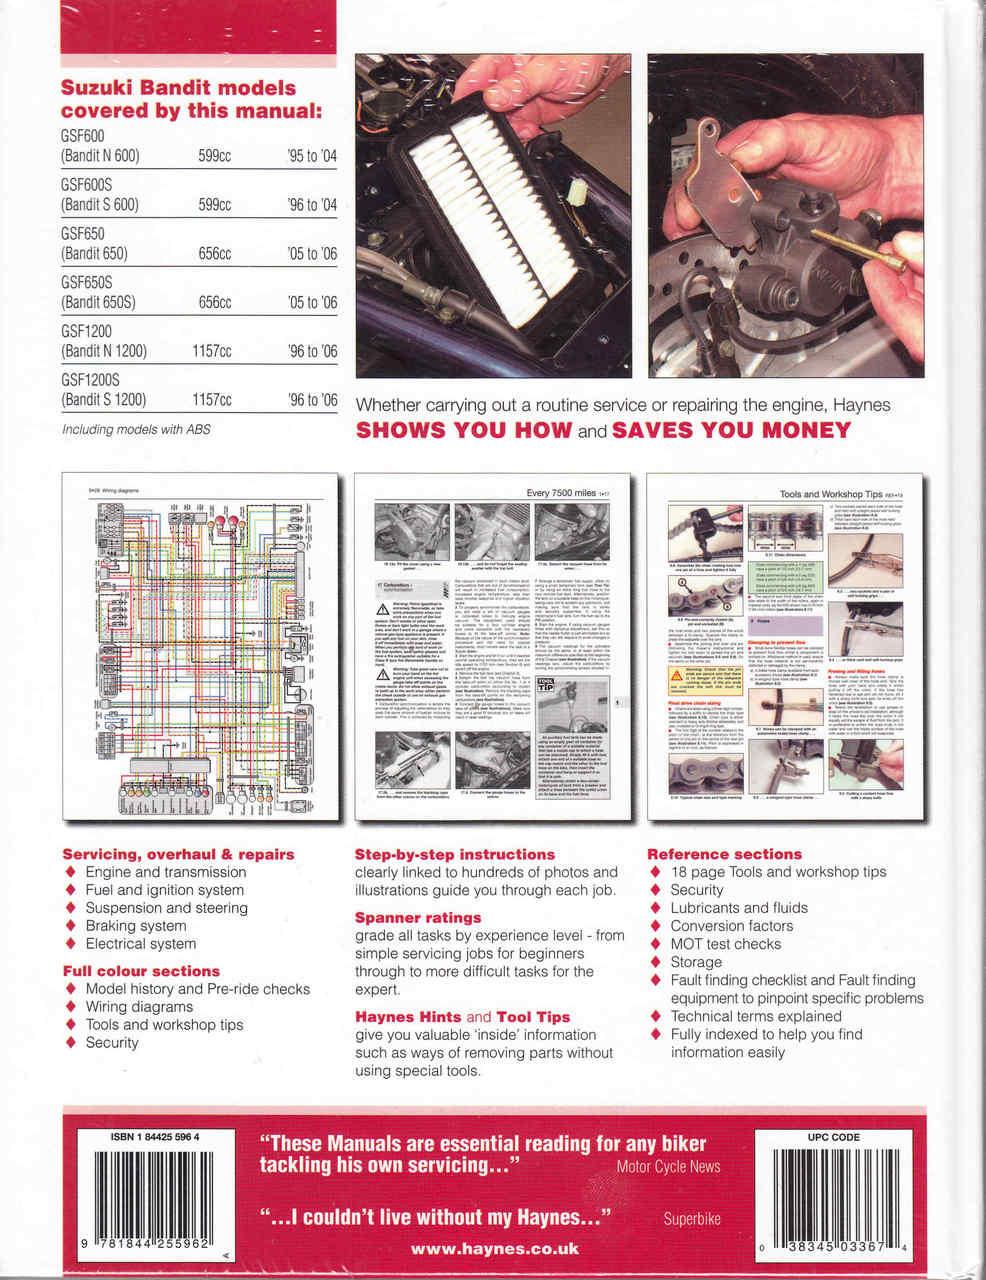 Suzuki Gsf600 650 1200 Bandit Fours 1995 To 1996 Service Repair 1998 Wiring Diagram Manual